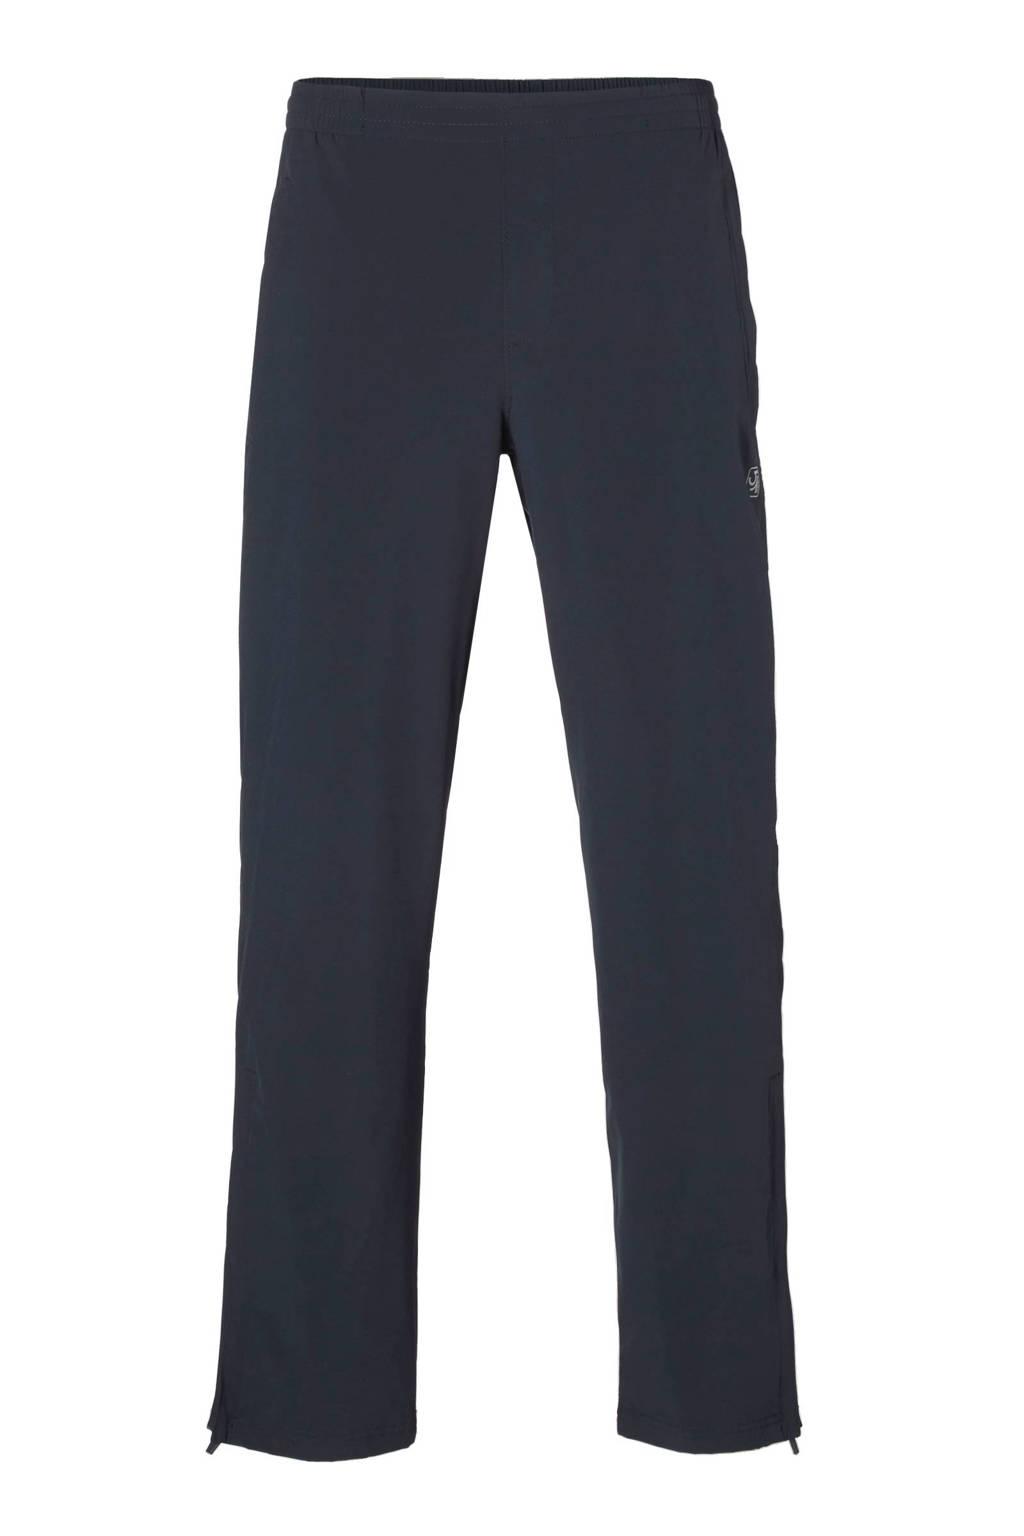 Sjeng Sports   broek Valencia donkerblauw, Marine